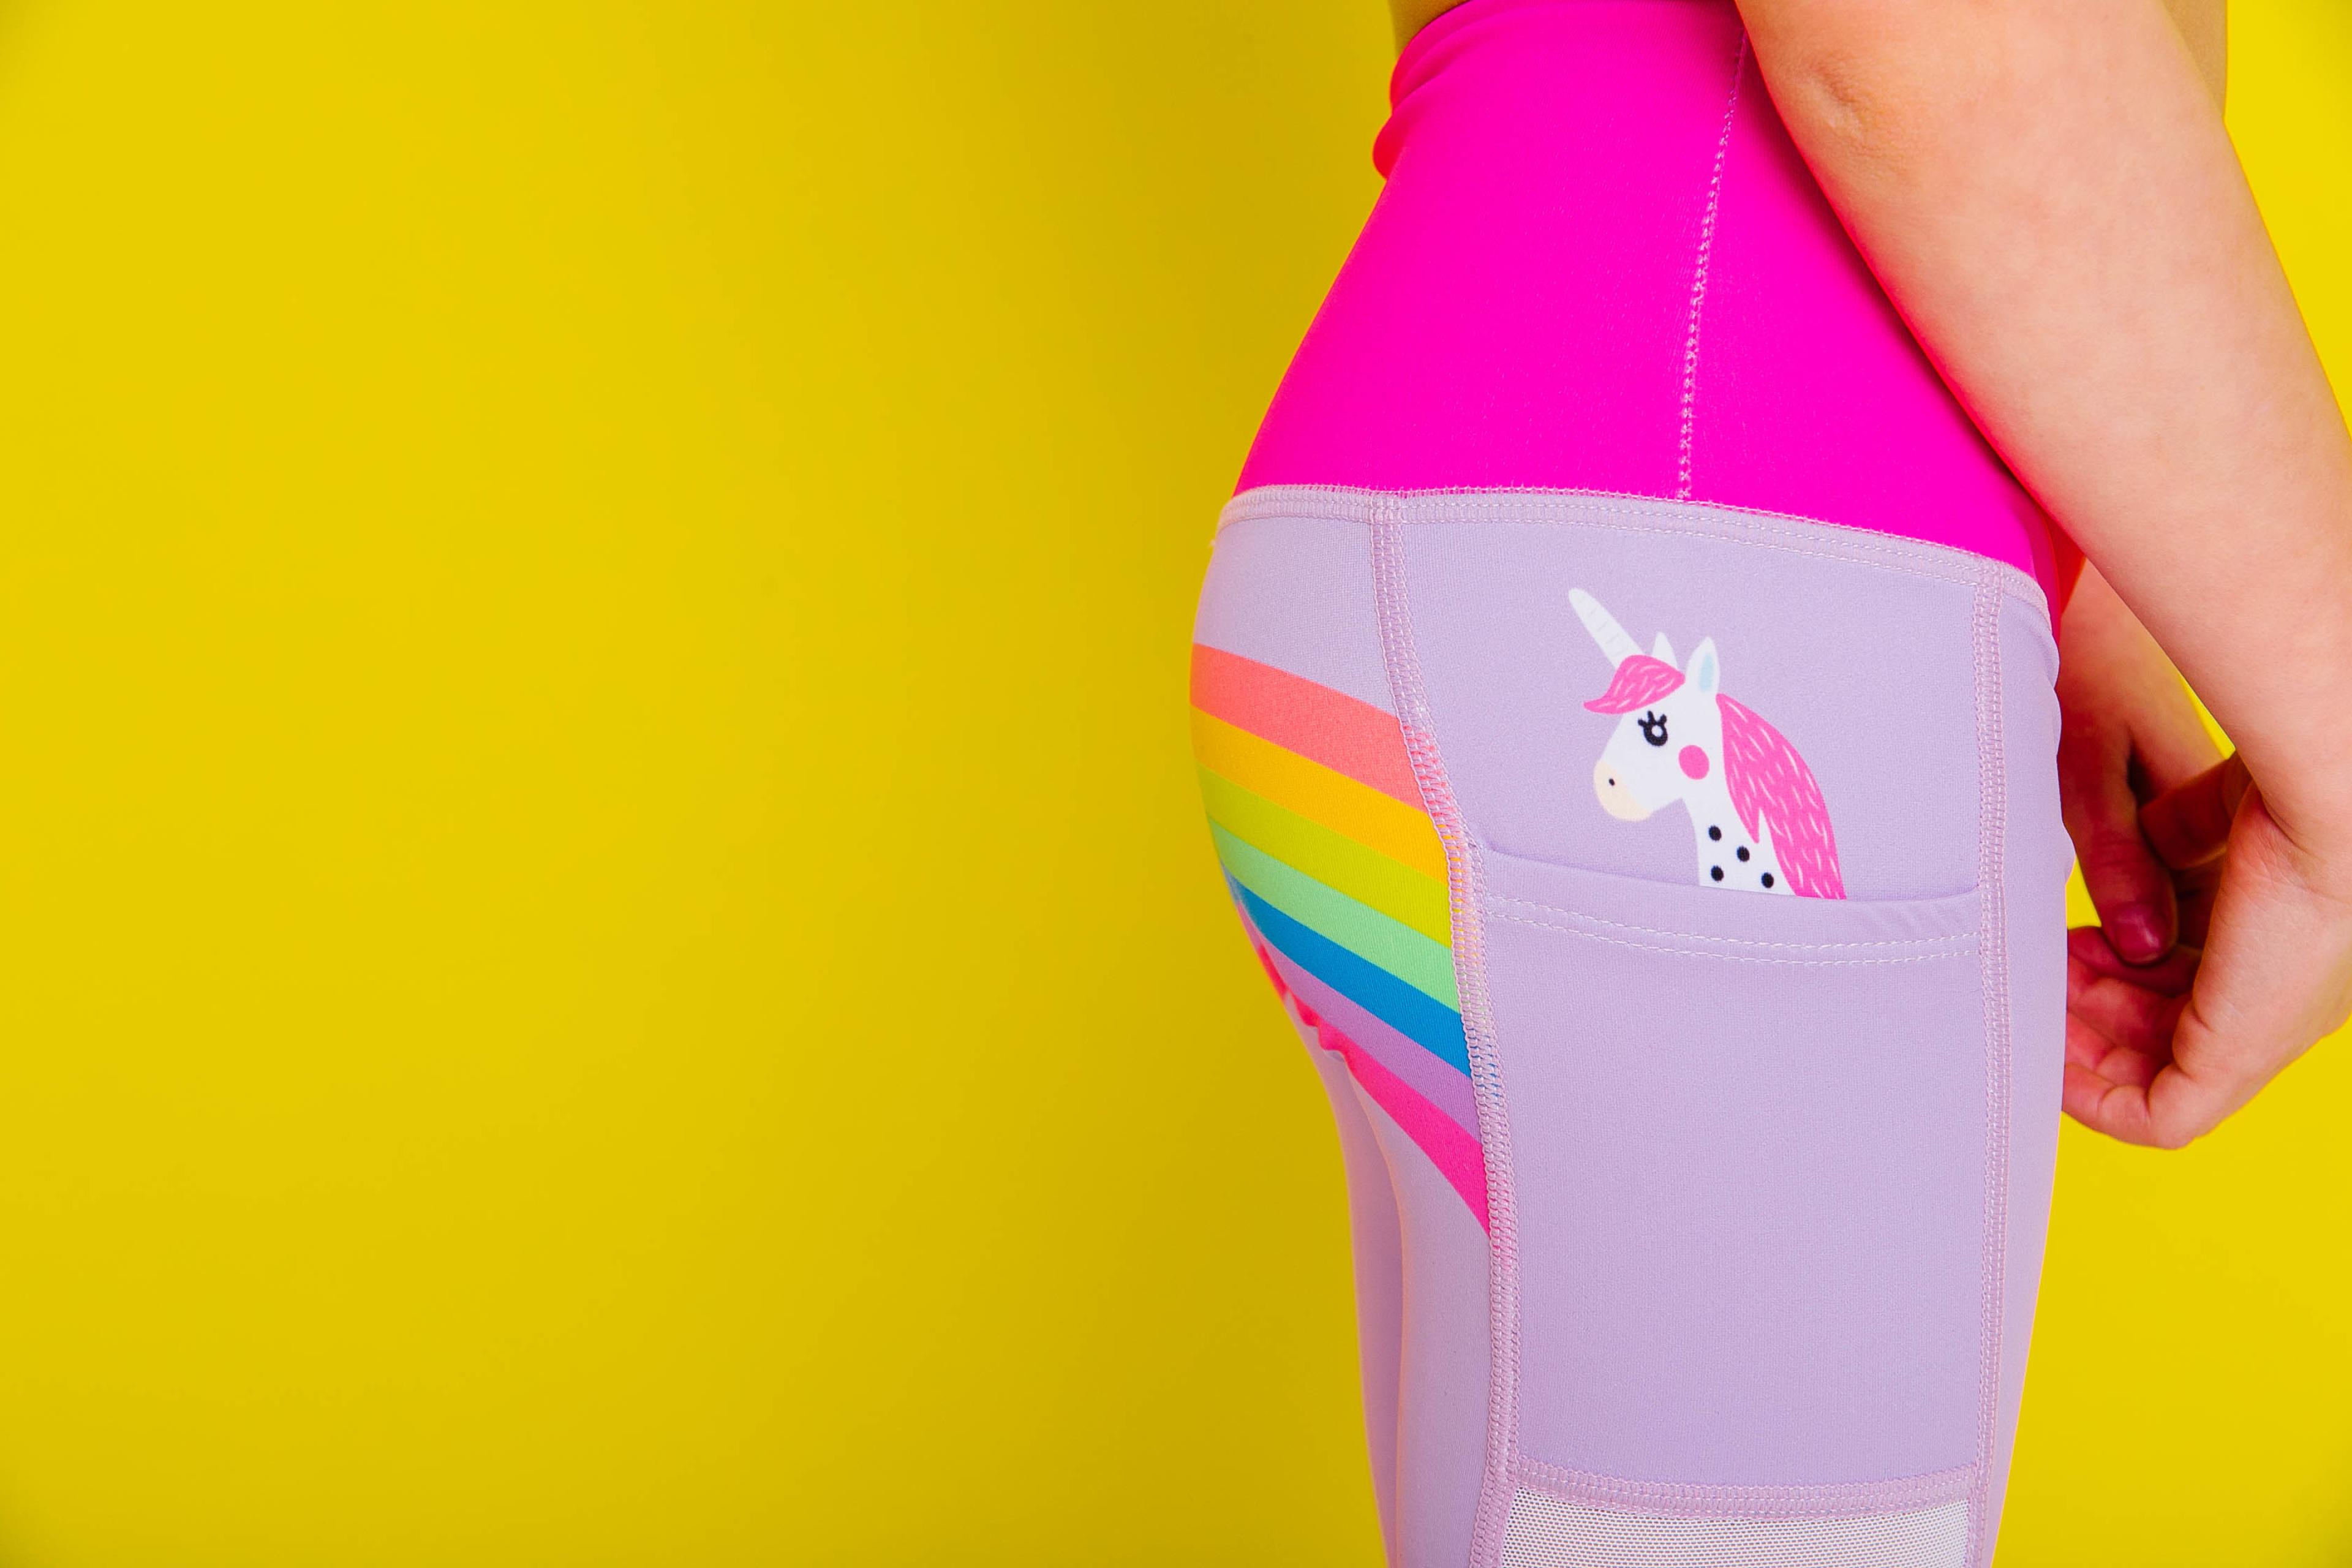 c2fb78c8310ff Details about Flexi Lexi Fitness Kids Minis Unicorn in My Pocket Yoga Pants  Sports Leggings